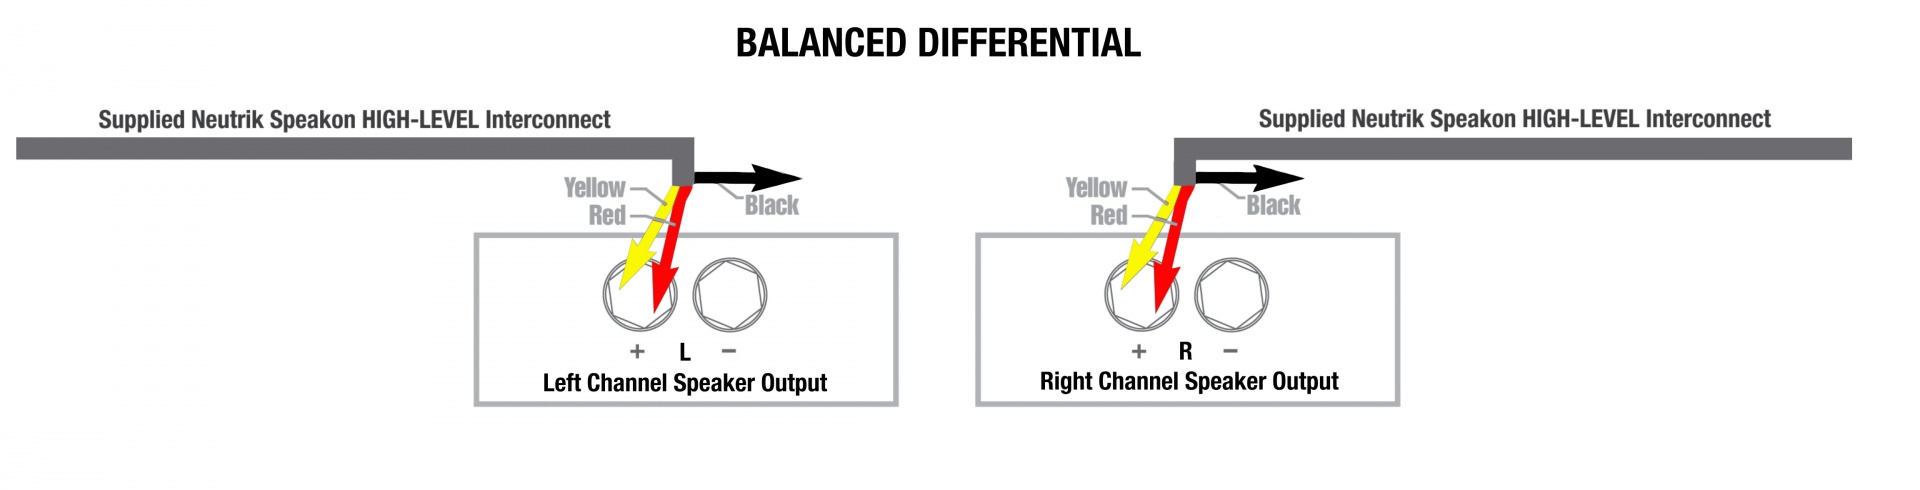 nl4fc wiring diagram vauxhall astra stereo best library rel speakon cable todays rh 20 11 12 1813weddingbarn com jack